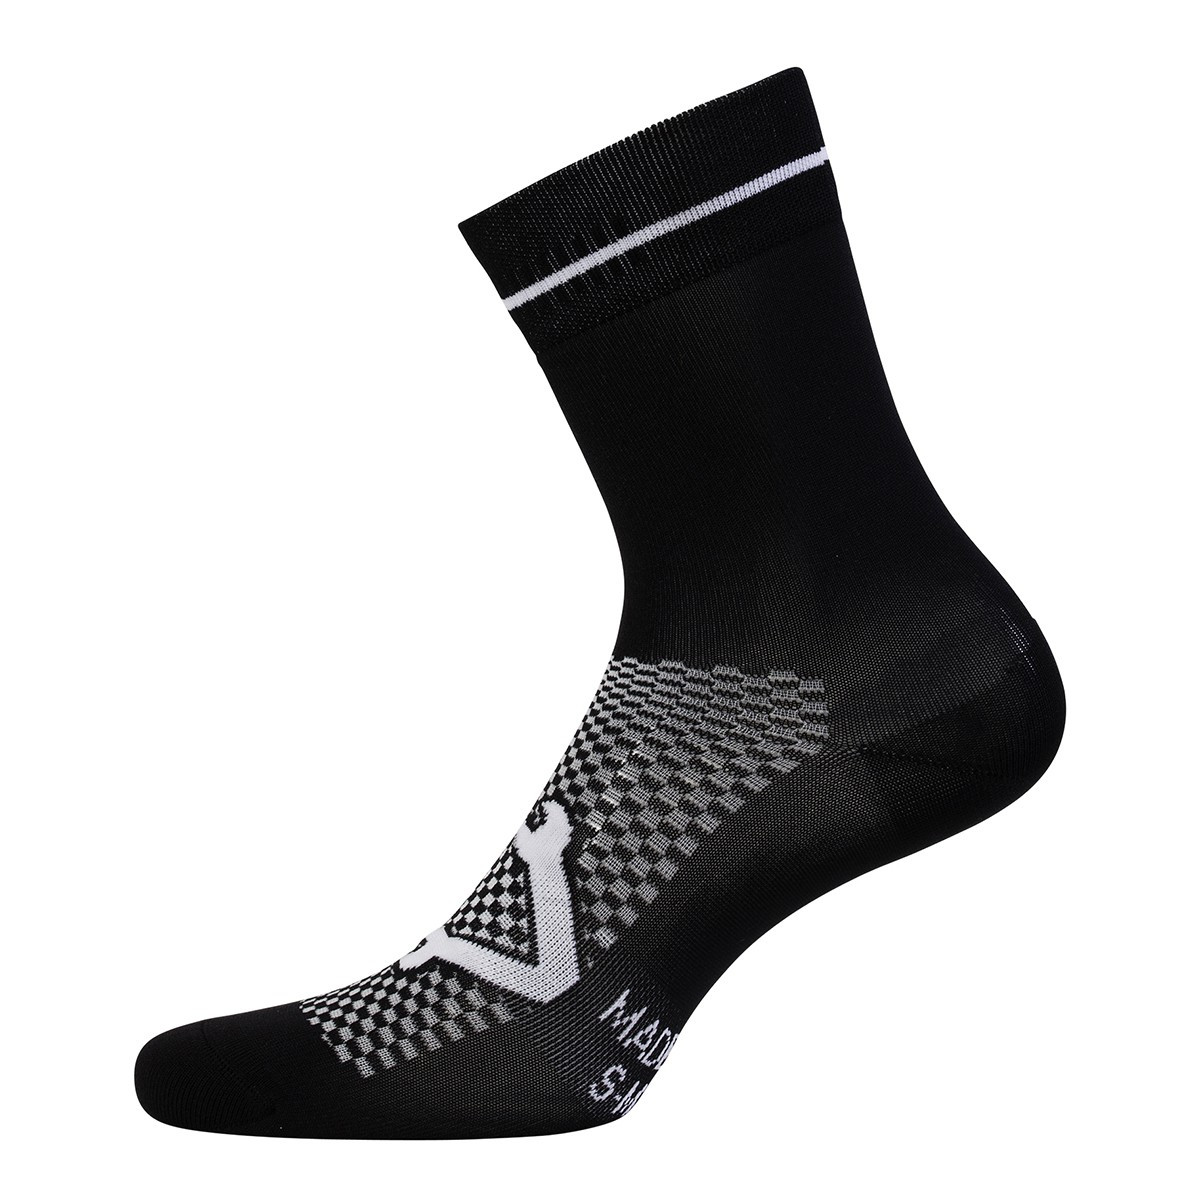 Nalini Lampo Black Socks